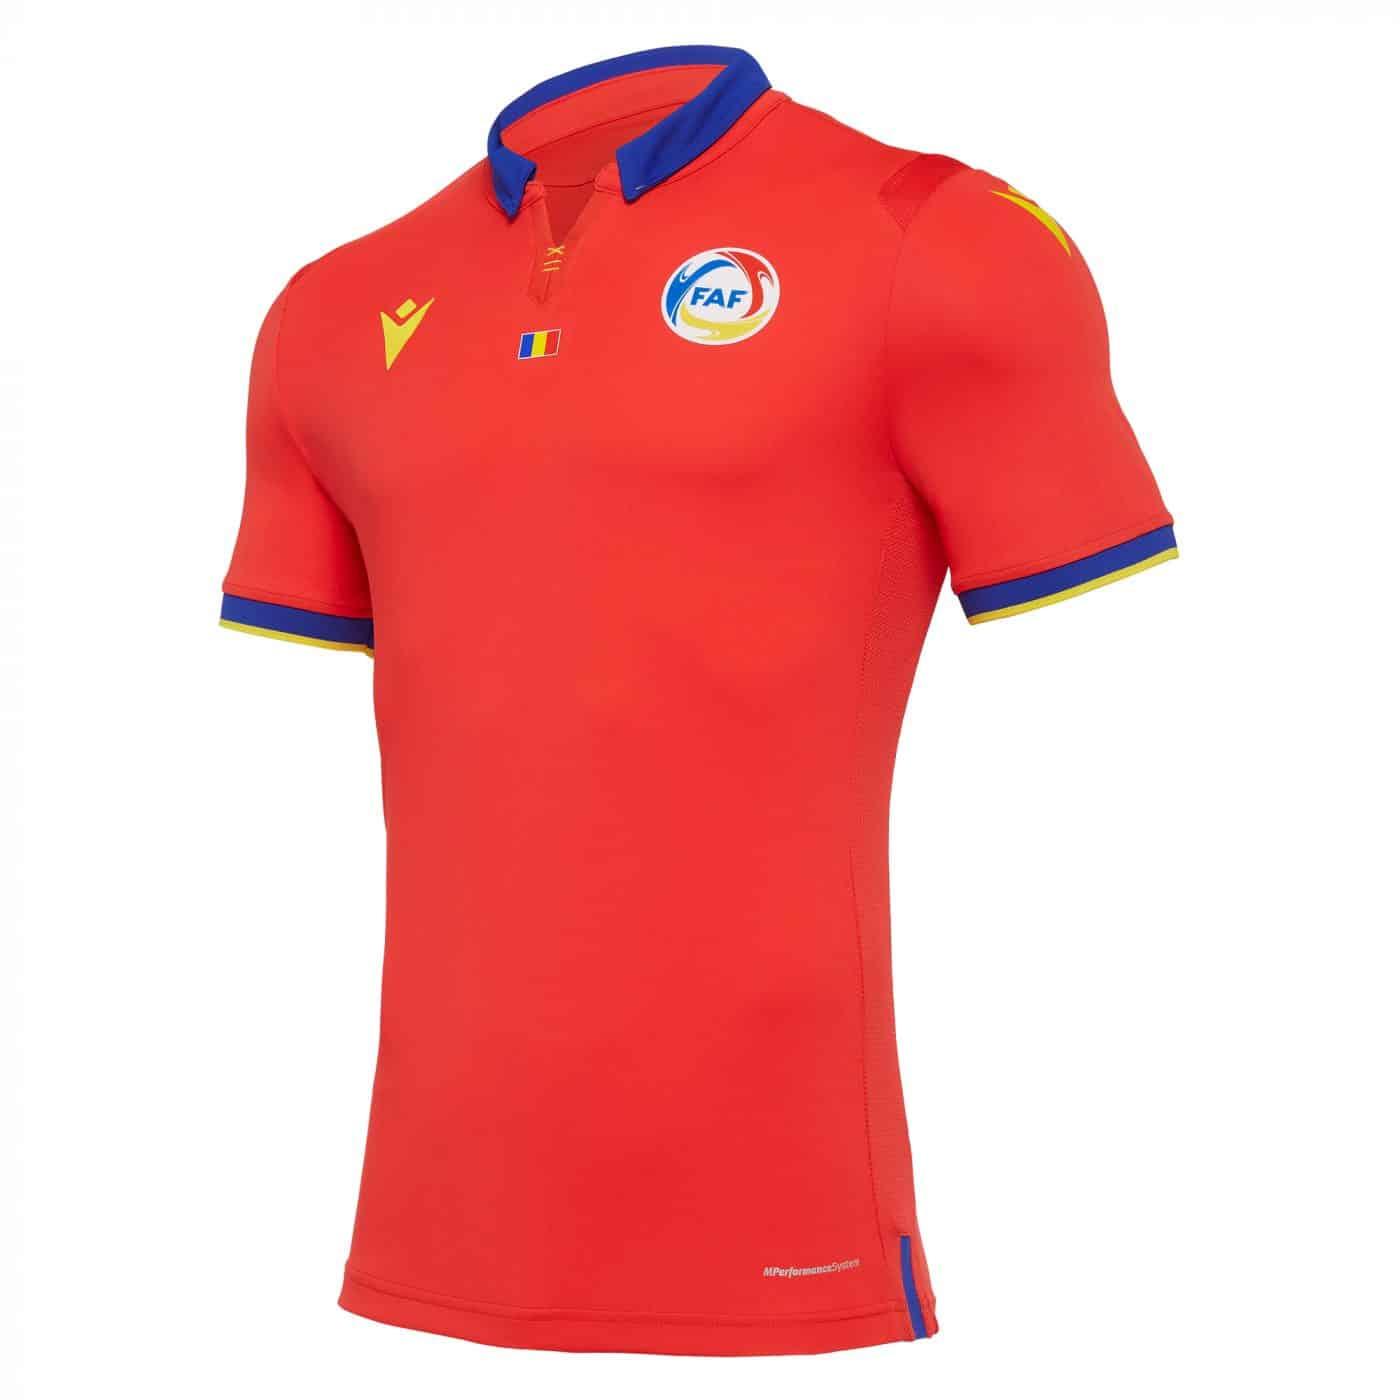 maillot-domicile-andorre-2020-2021-macron-uefa-andorra-jersey